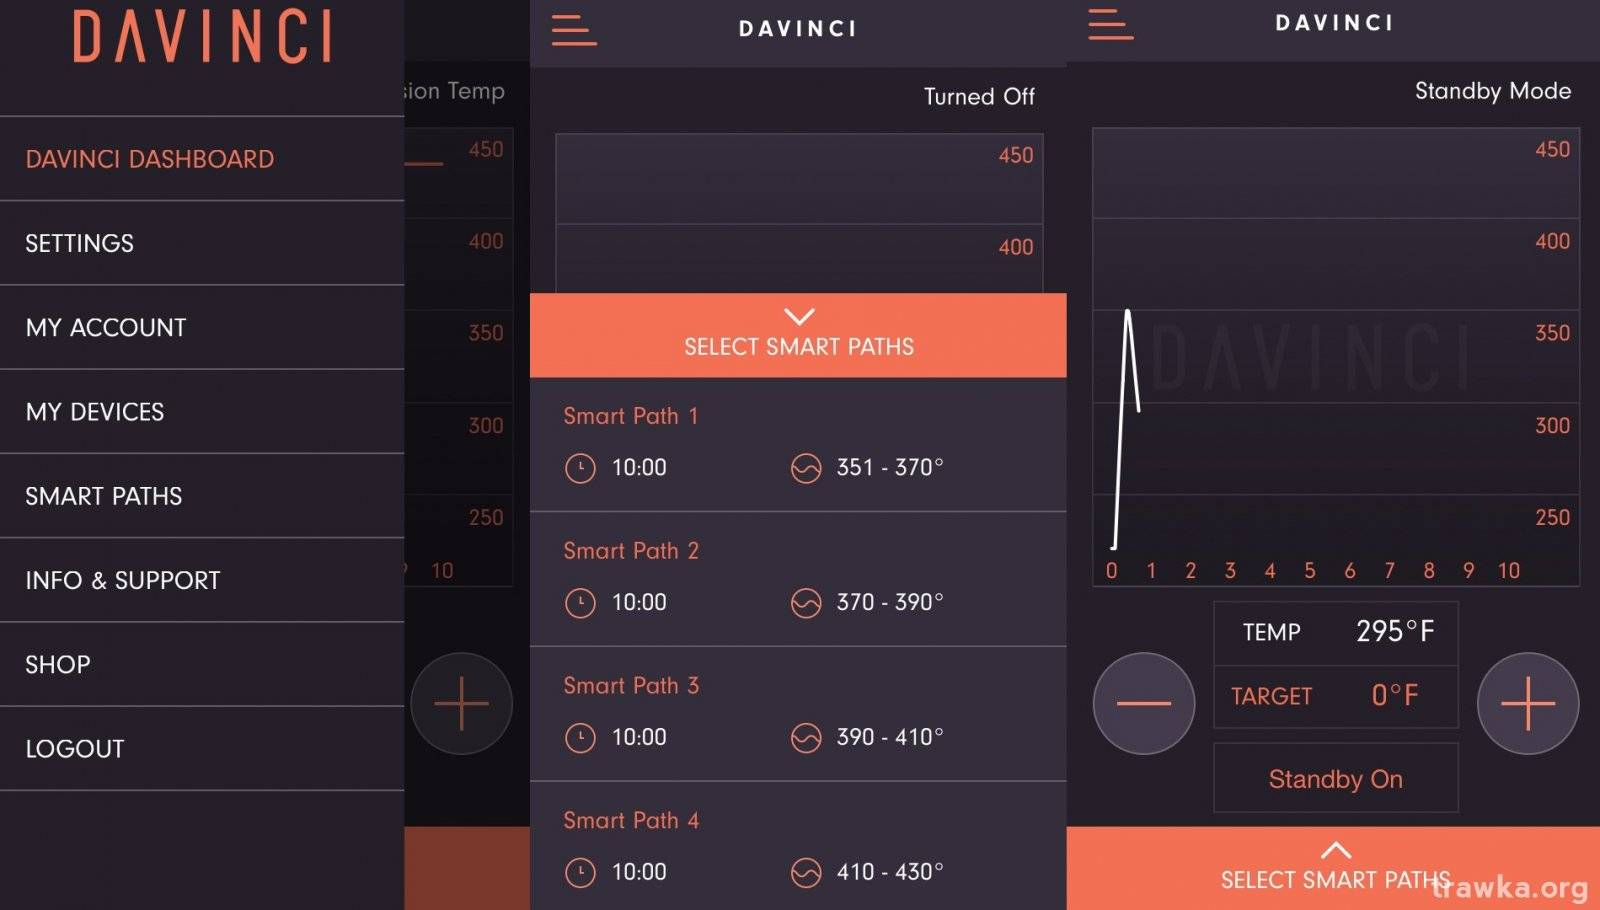 Davinci IQ Vaporizer Smartphone App Screenshots